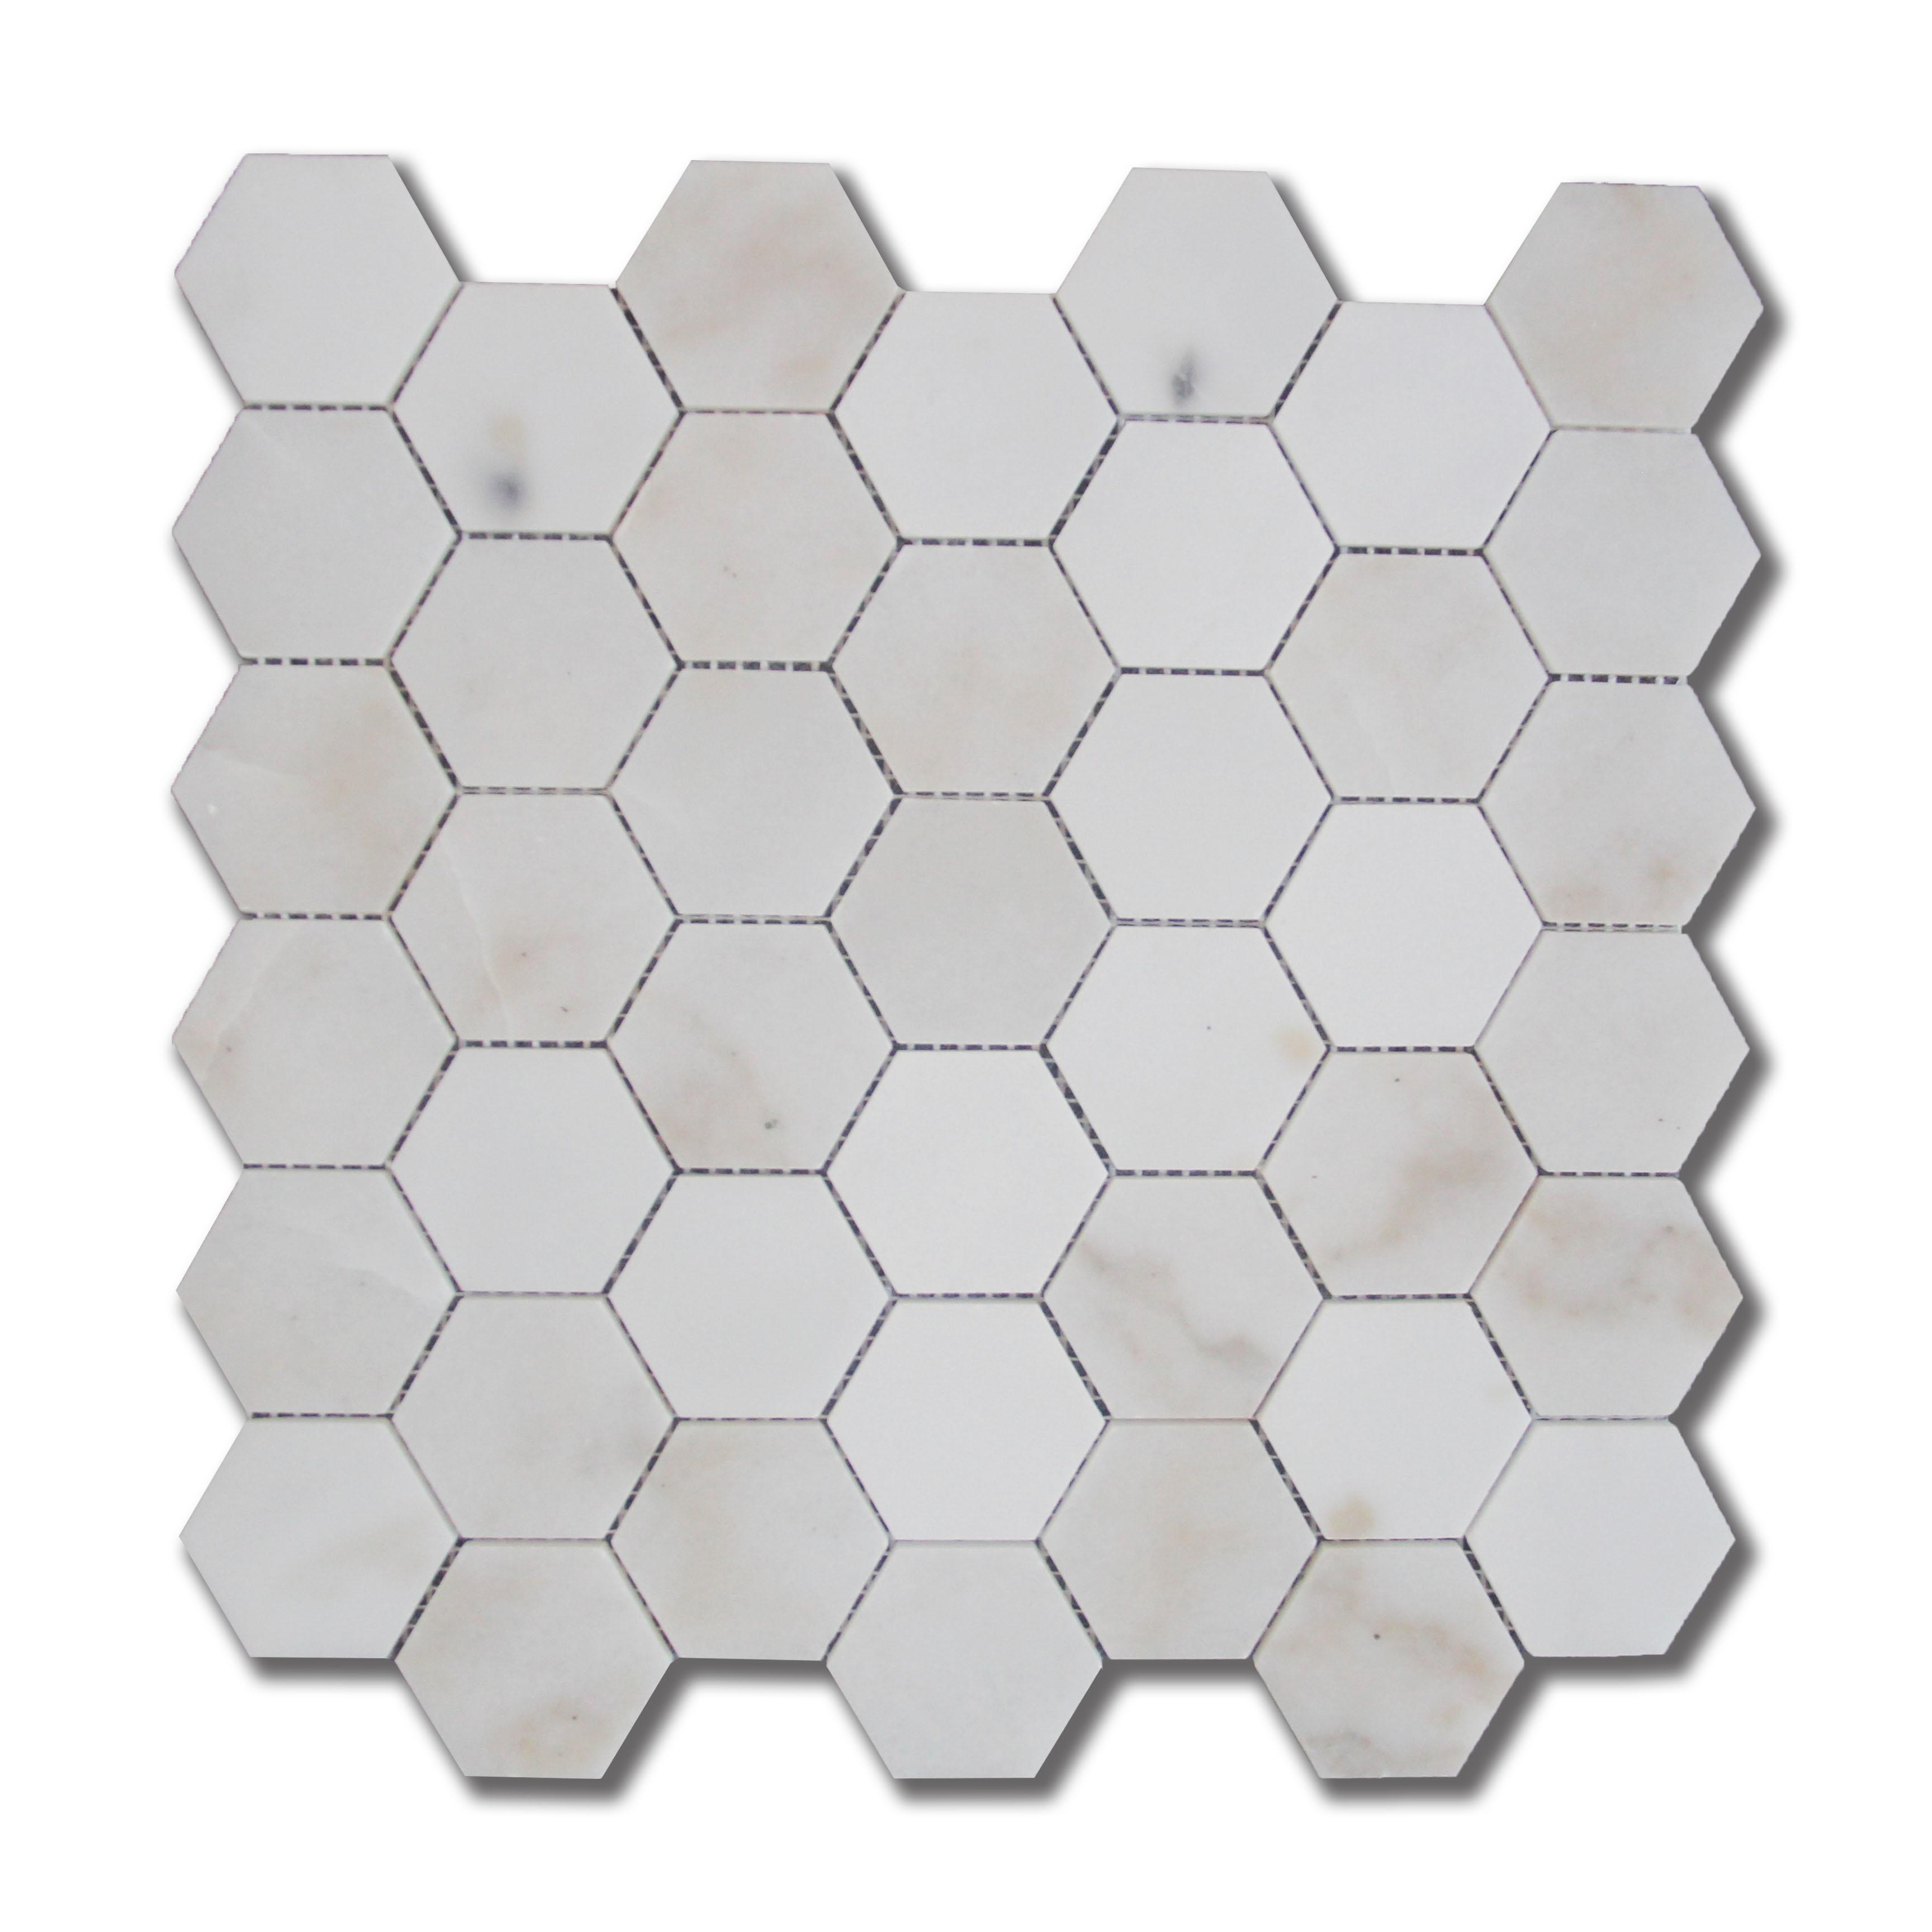 Guangxi white waterjet mosaic marble hexagon mosaic tile for kitchen backsplash, wall decoration